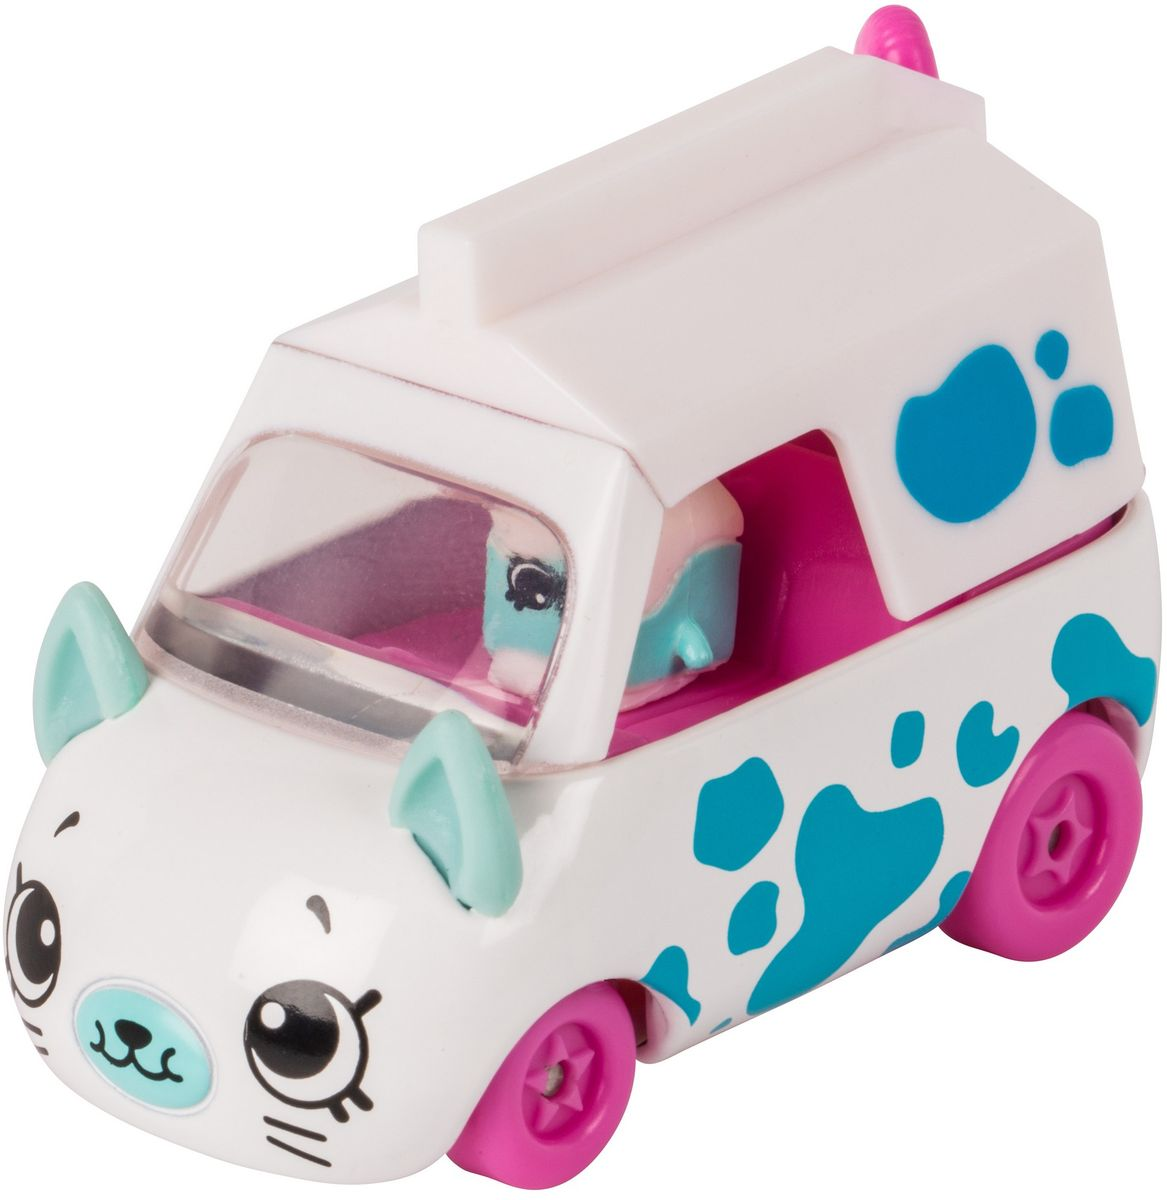 Moose Игровой набор Cutie Car с мини-фигуркой Shopkins S1 56591/ast56742 moose брелок poppy corn shopkins